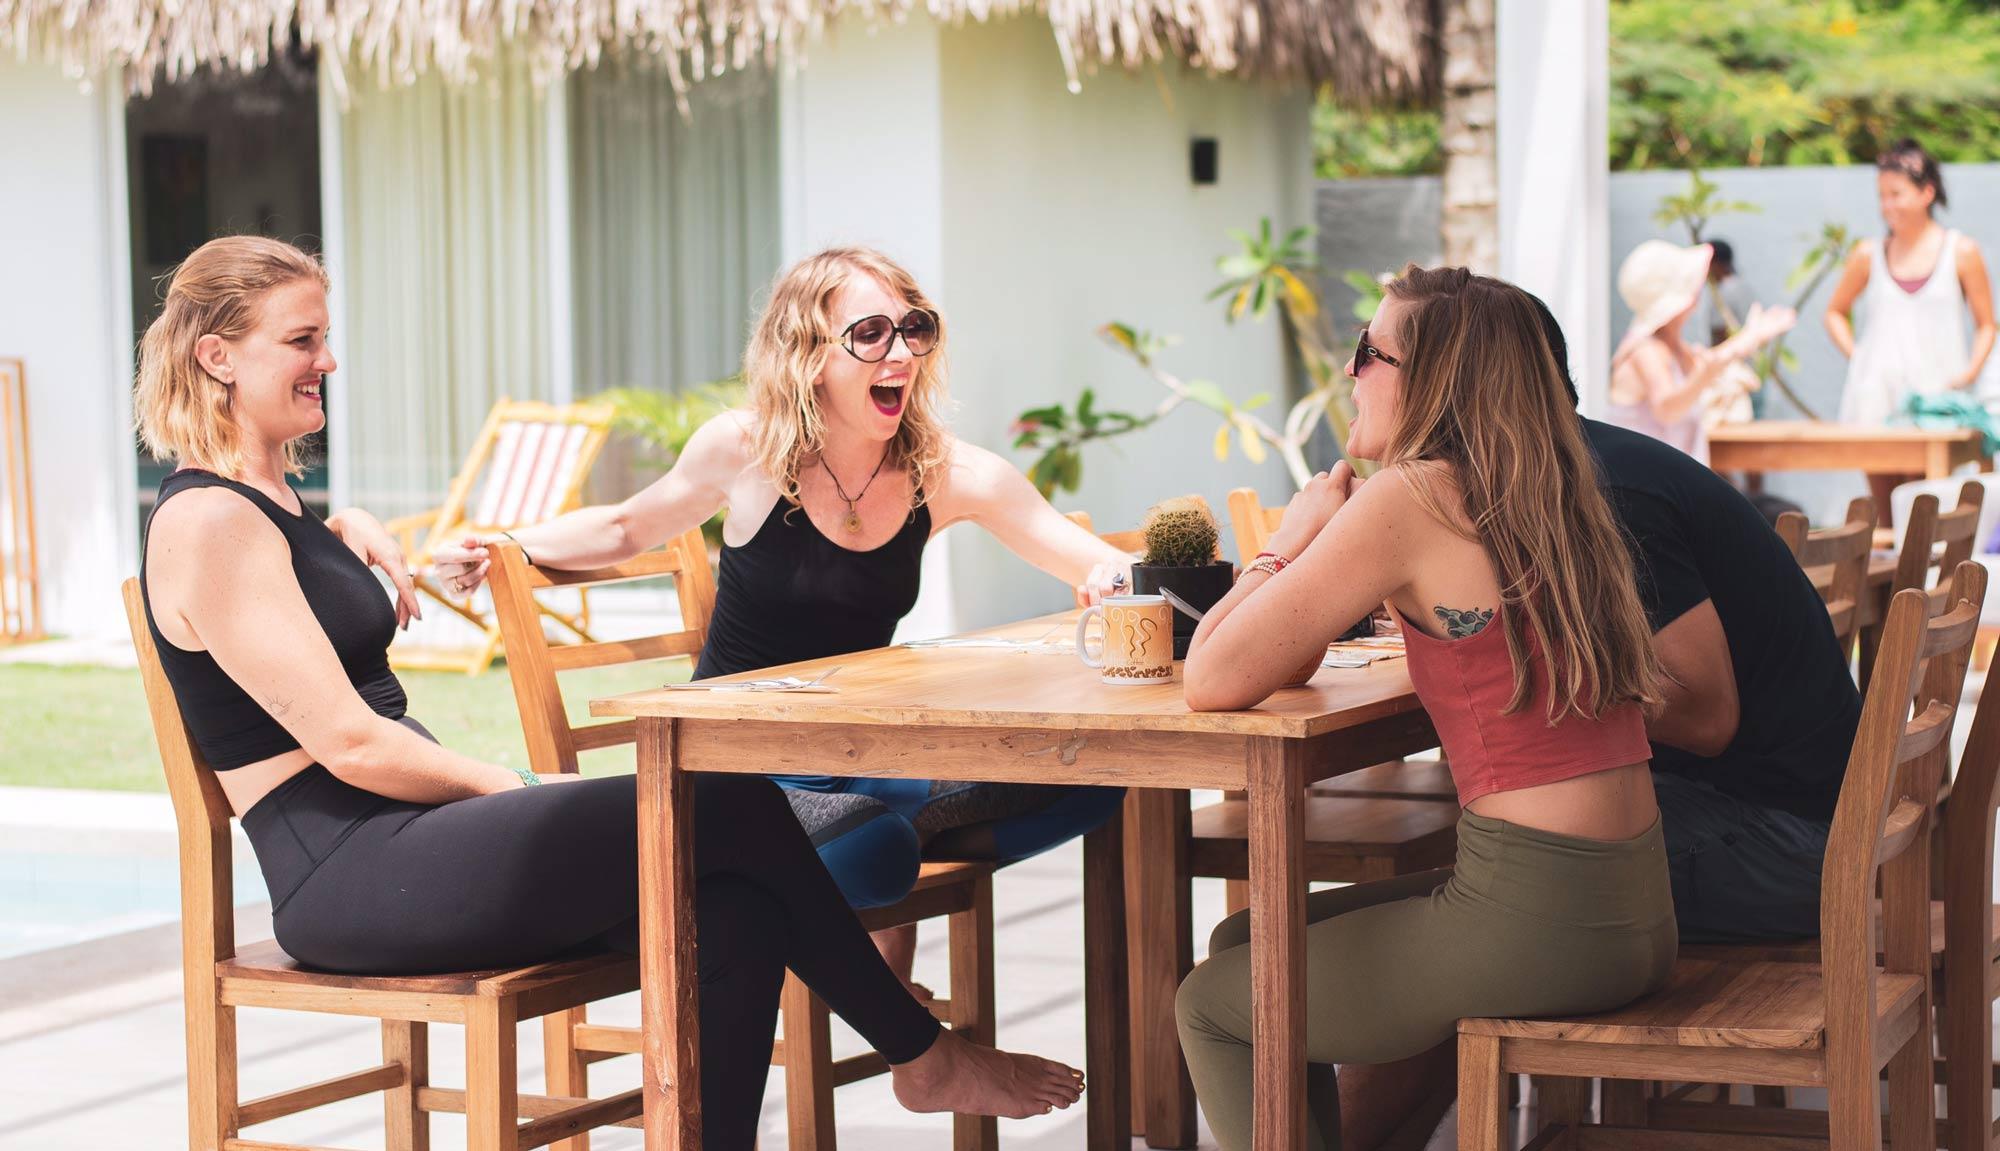 Vikara olon Ecuador pool yoga and surf retreats